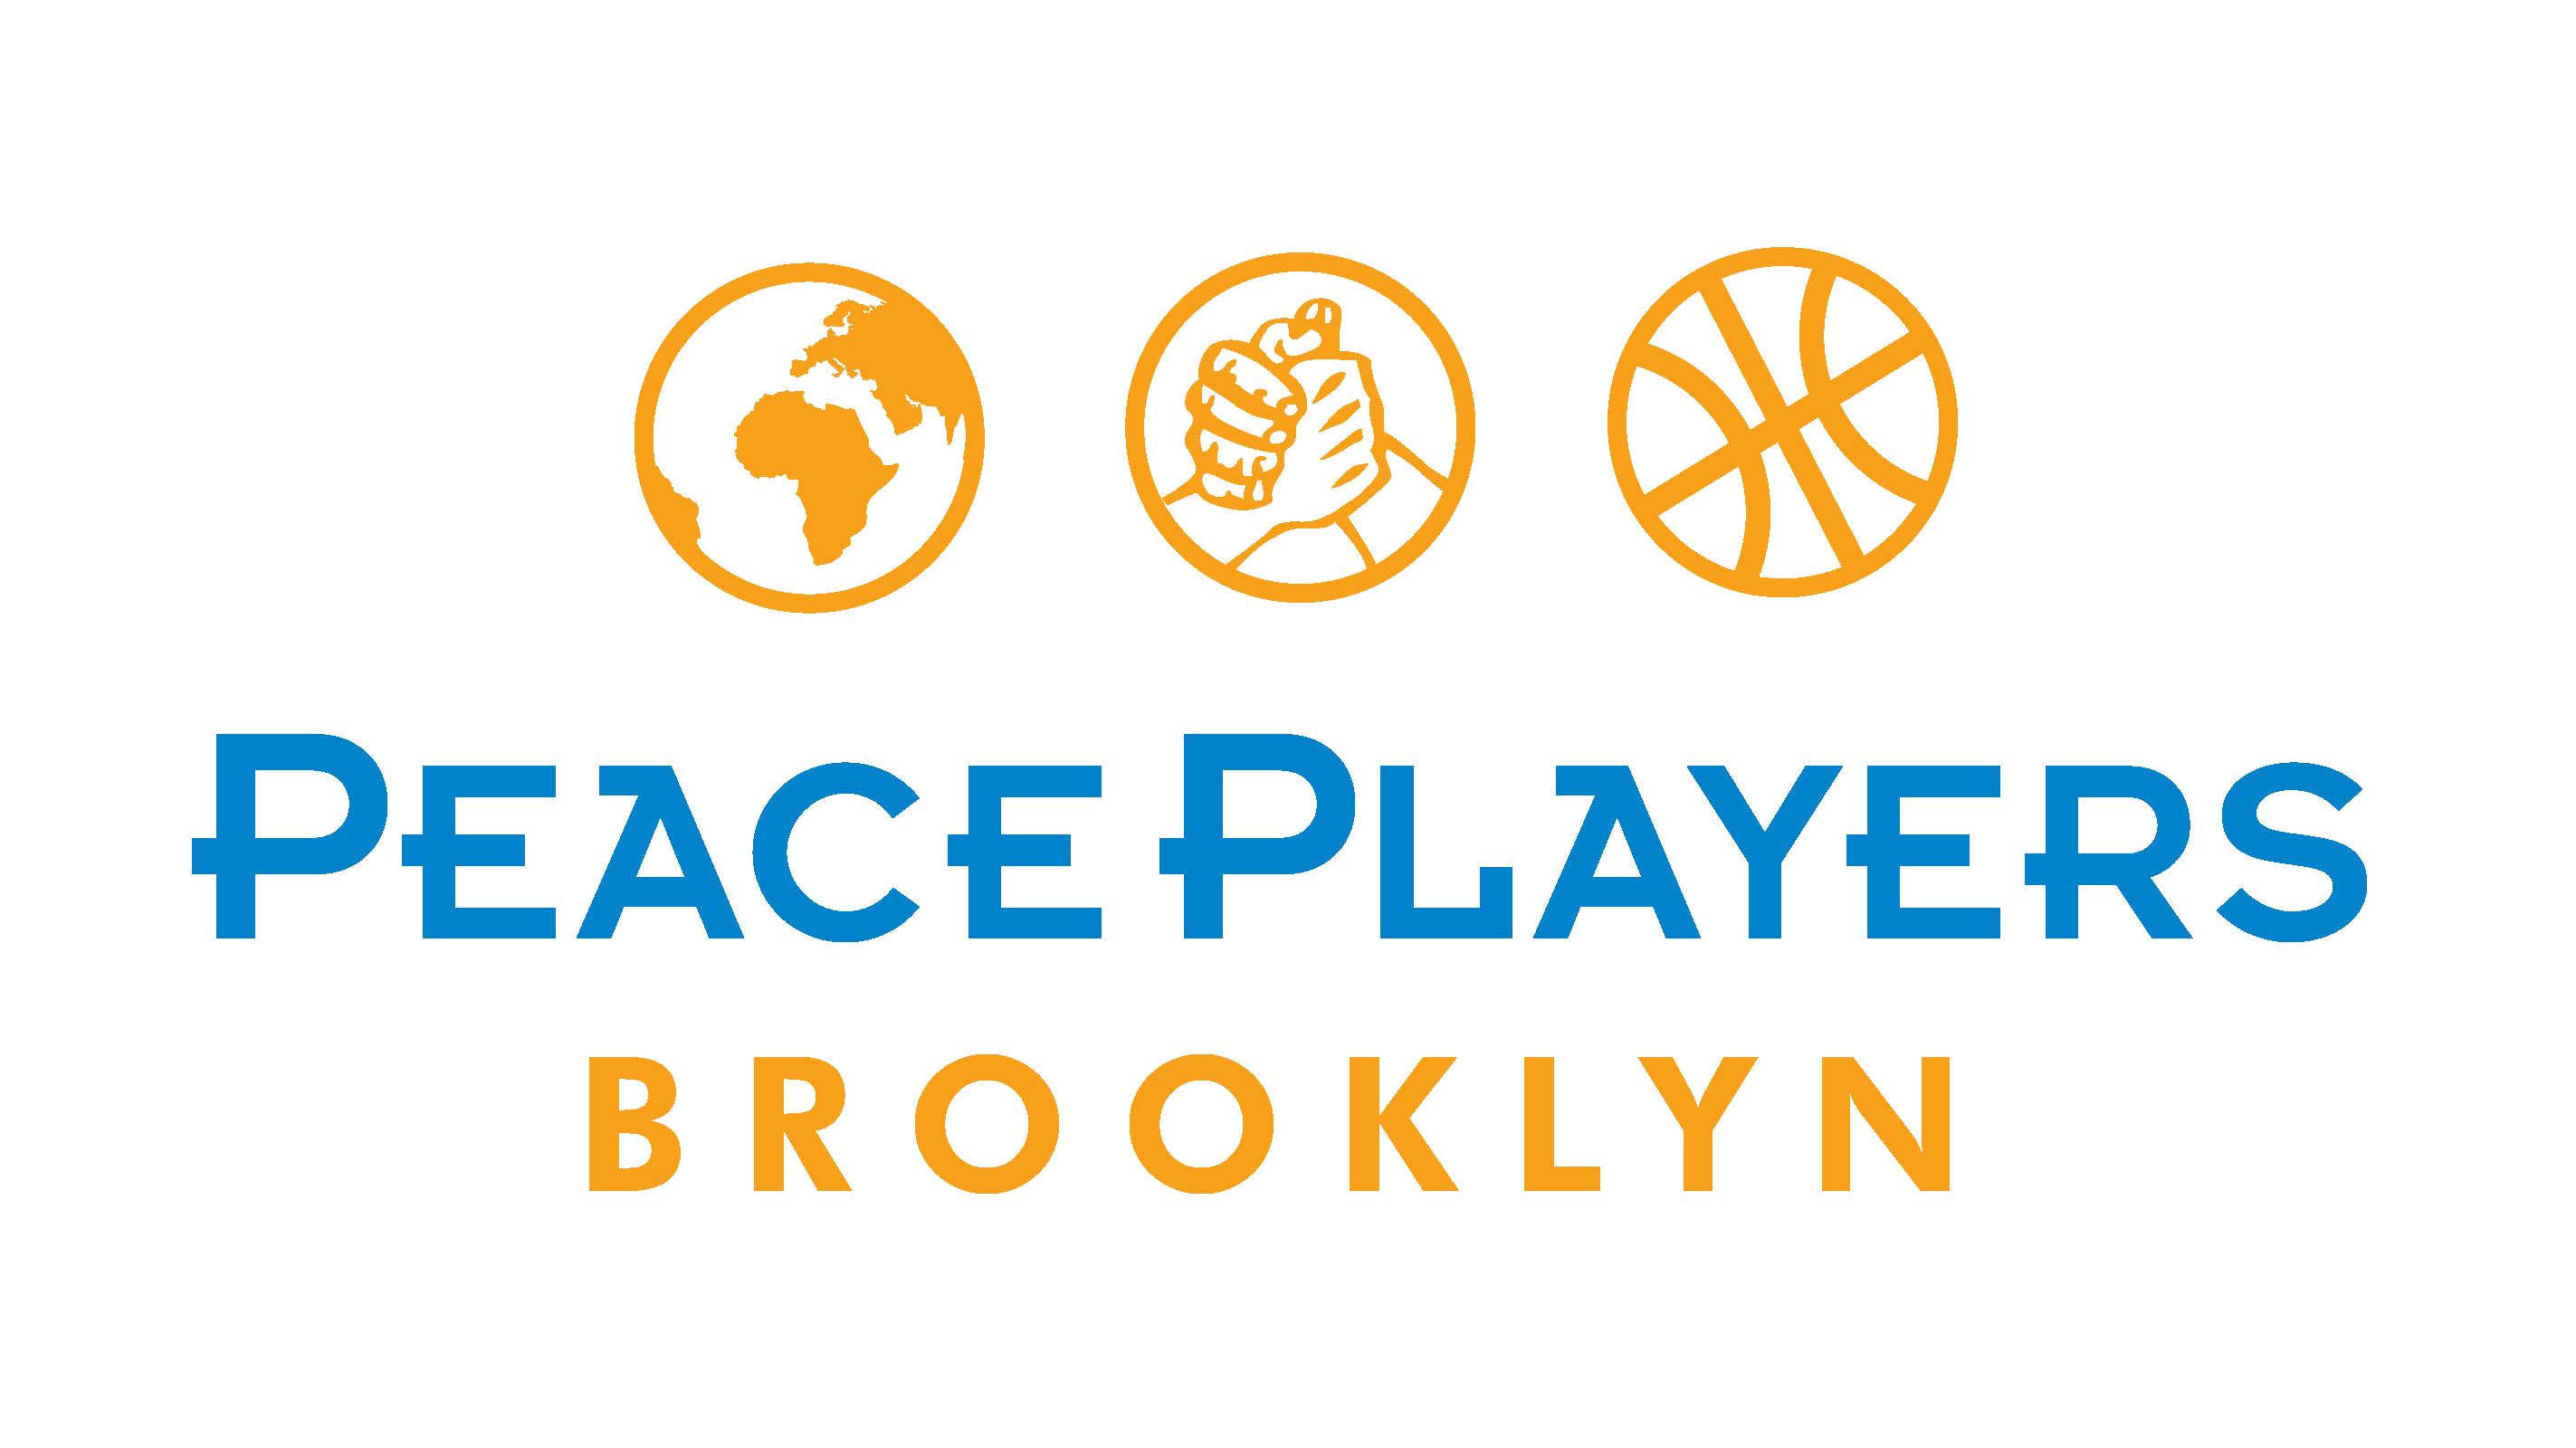 PeacePlayers Brooklyn Logo